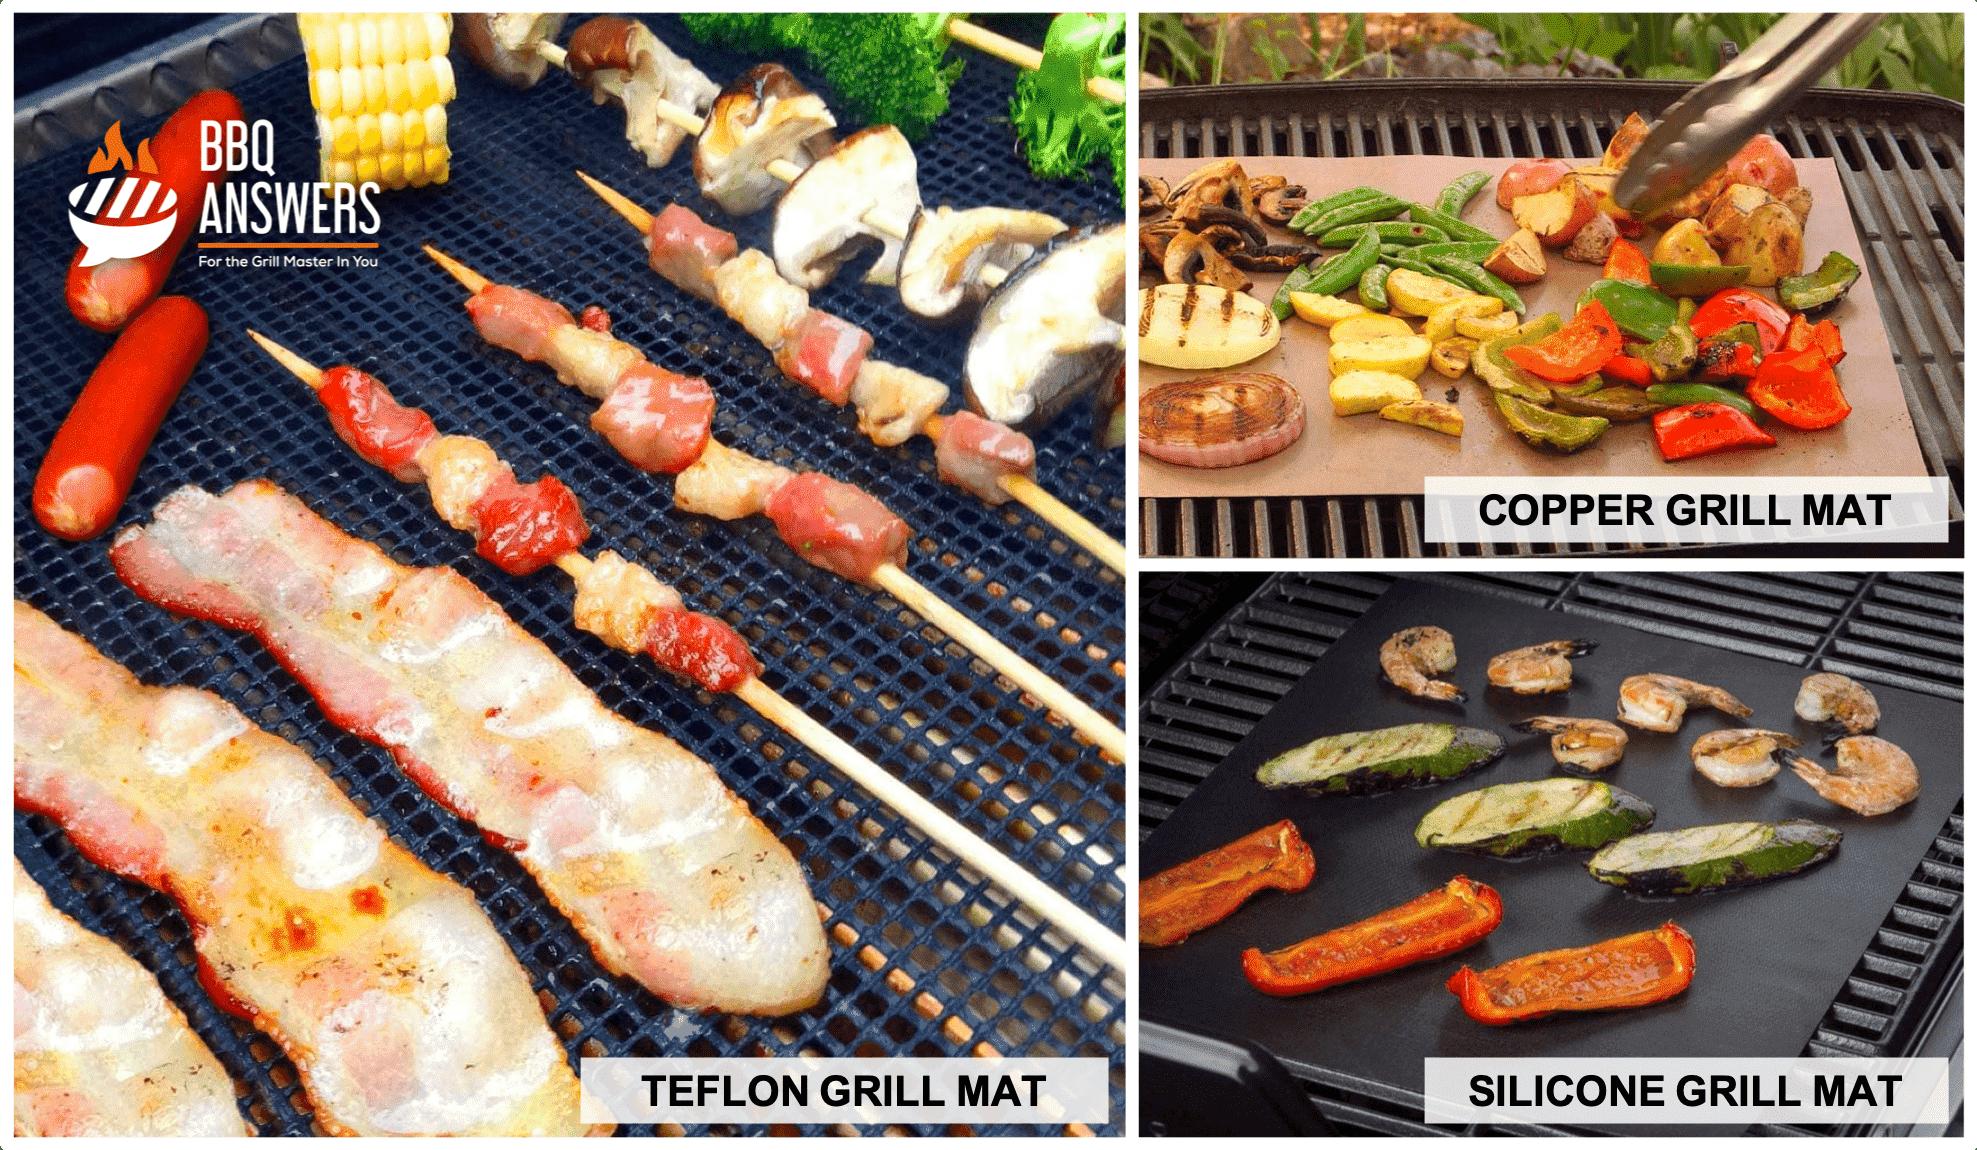 Types of Grill Mats | BBQ Grill Mats | BBQanswers